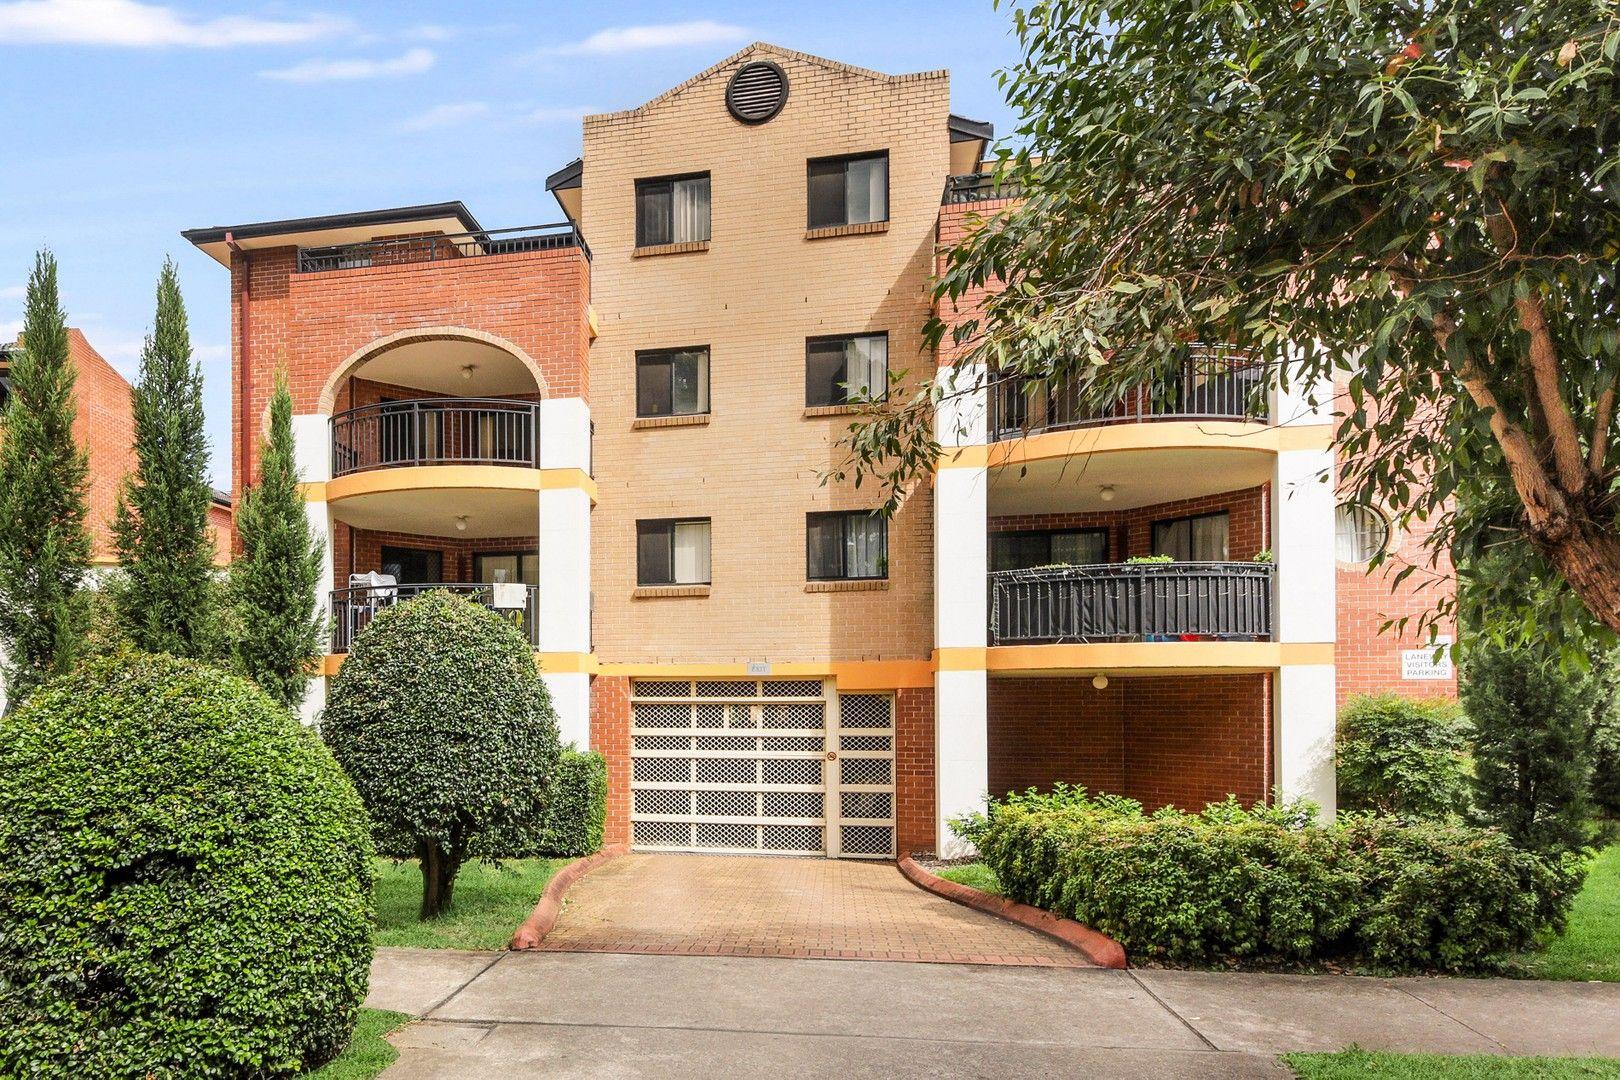 23/1-7 Belmore, North Parramatta NSW 2151, Image 0